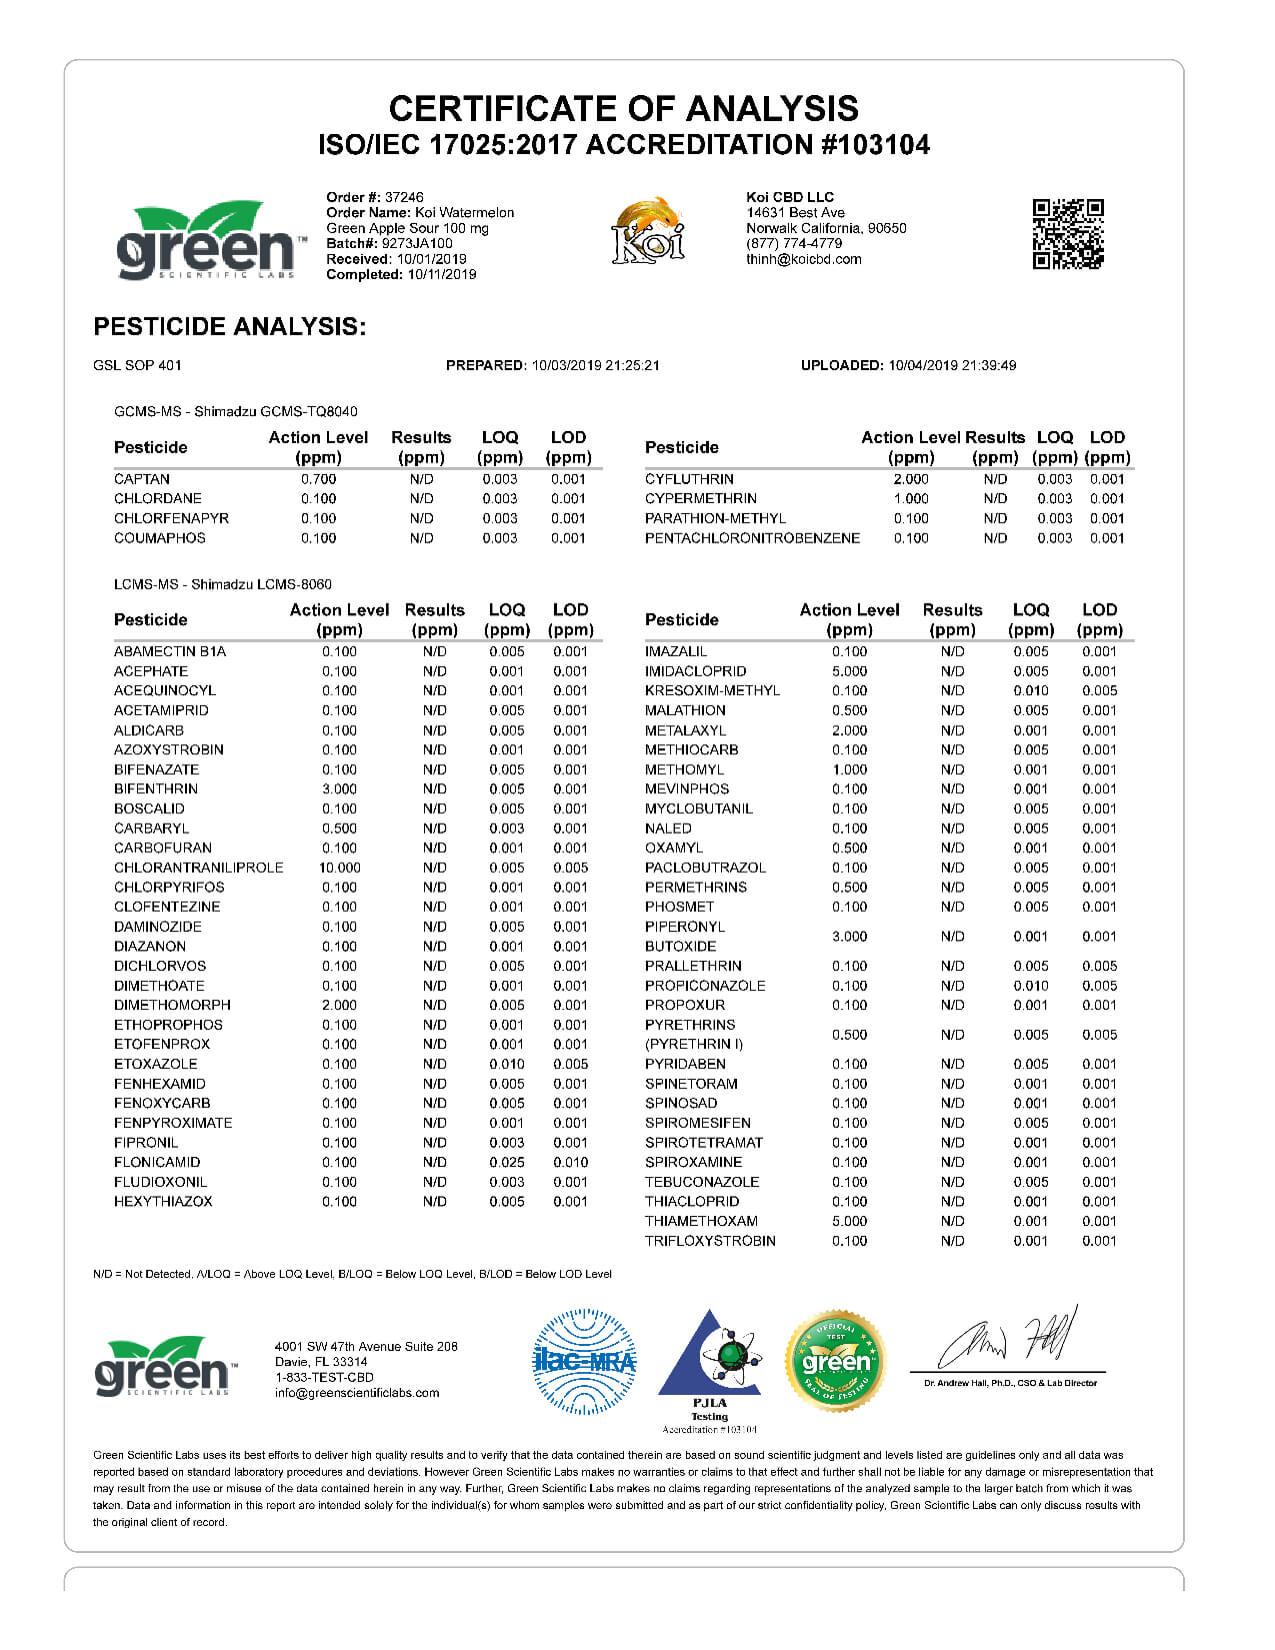 Koi CBD Watermelon Green Apple Sour Vape Oil 100mg page3